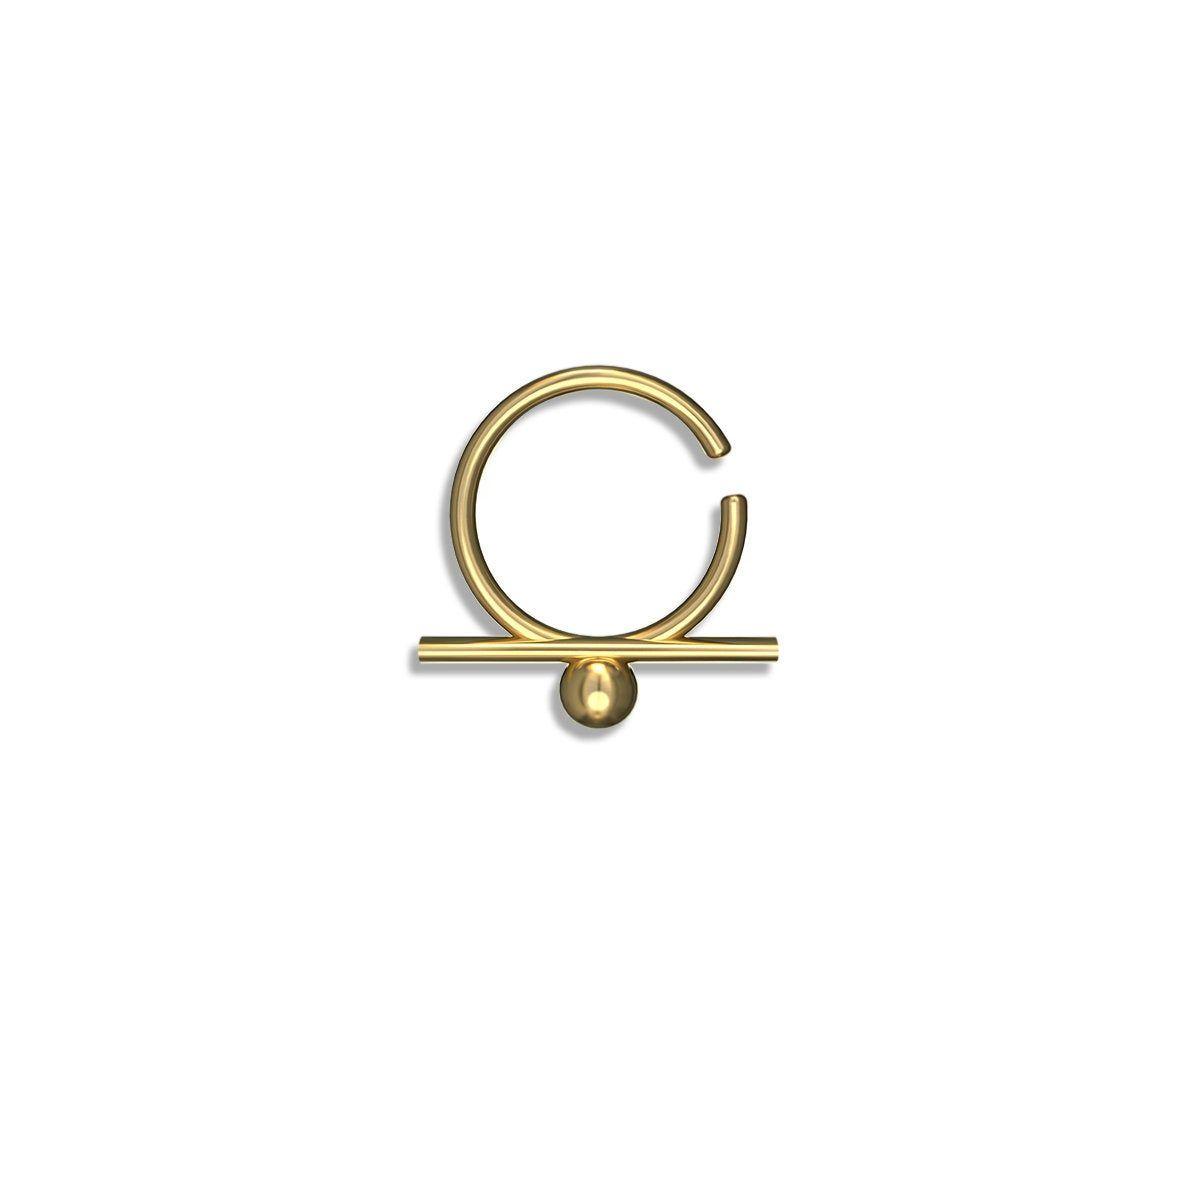 Unique septum ring , Septum , Male septum ring , Male septum , unique septum , gold septum ring , spetum , cool septum ring, Free Shipping